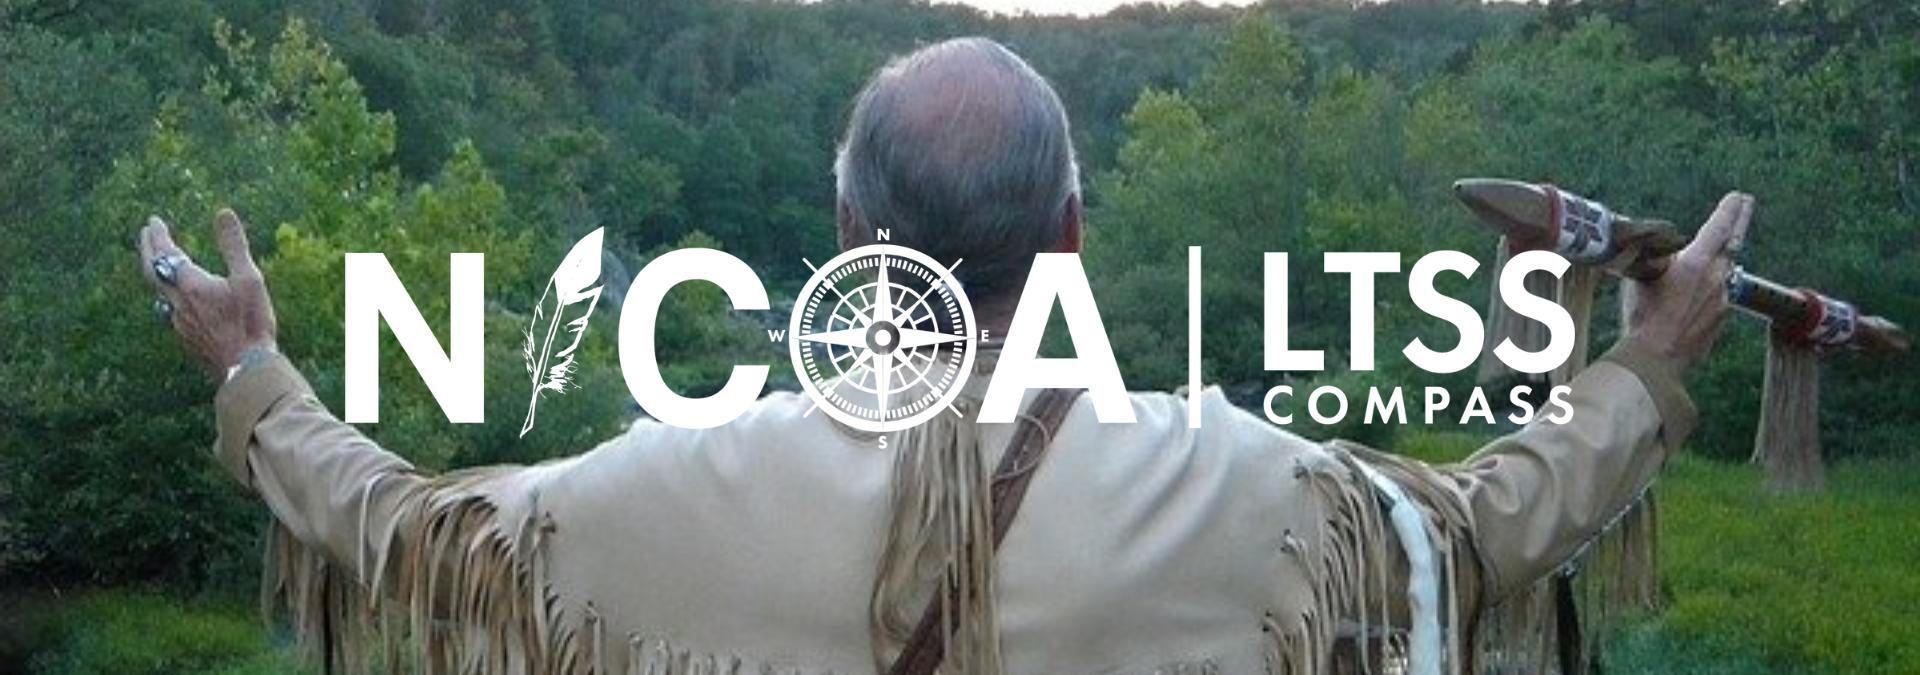 NICOA LTSS Compass